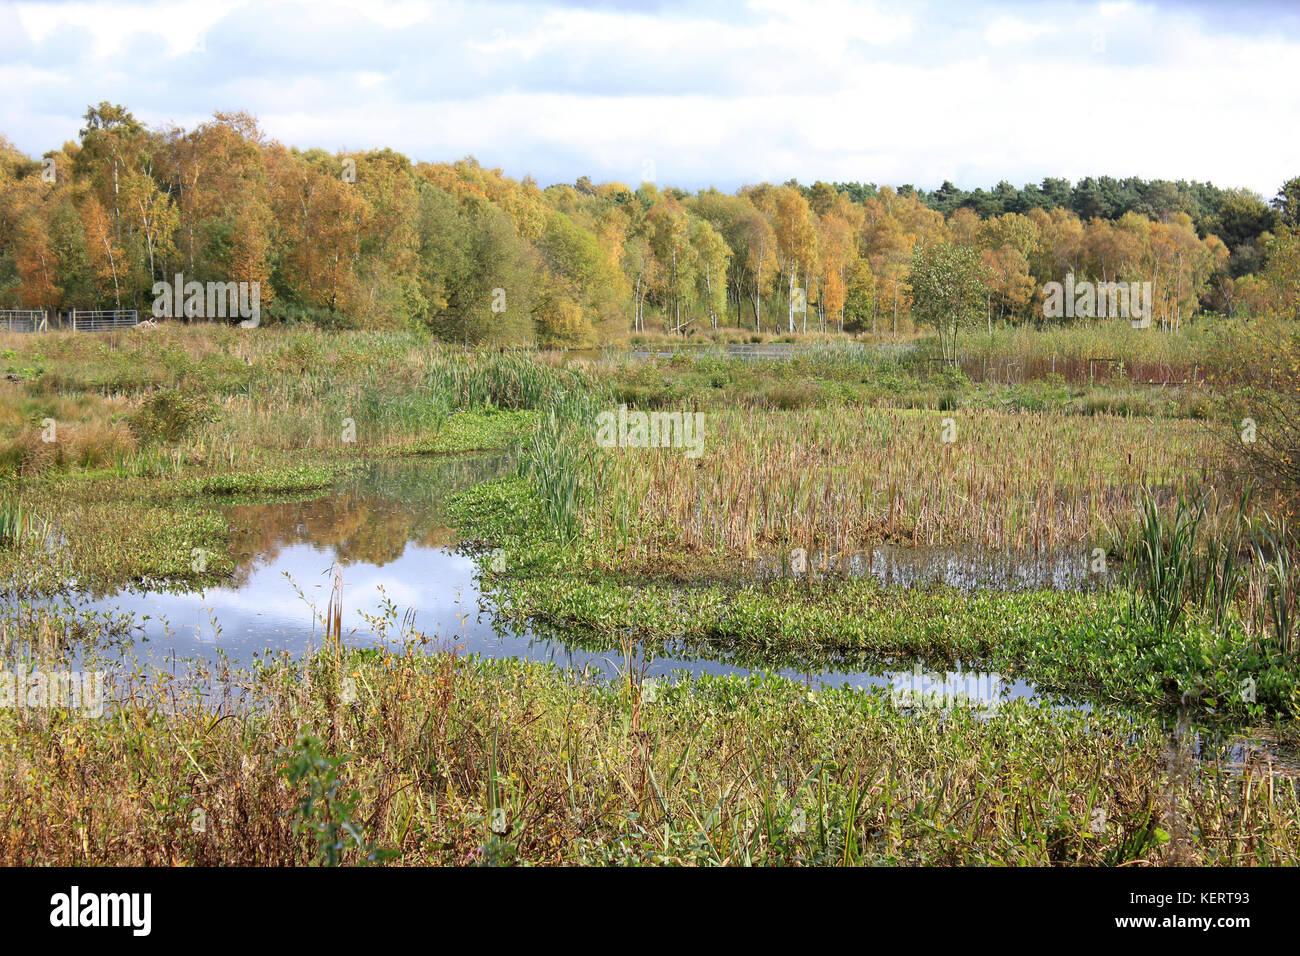 Reedbeds at Mere Sands Wood Nature Reserve, UK - Stock Image